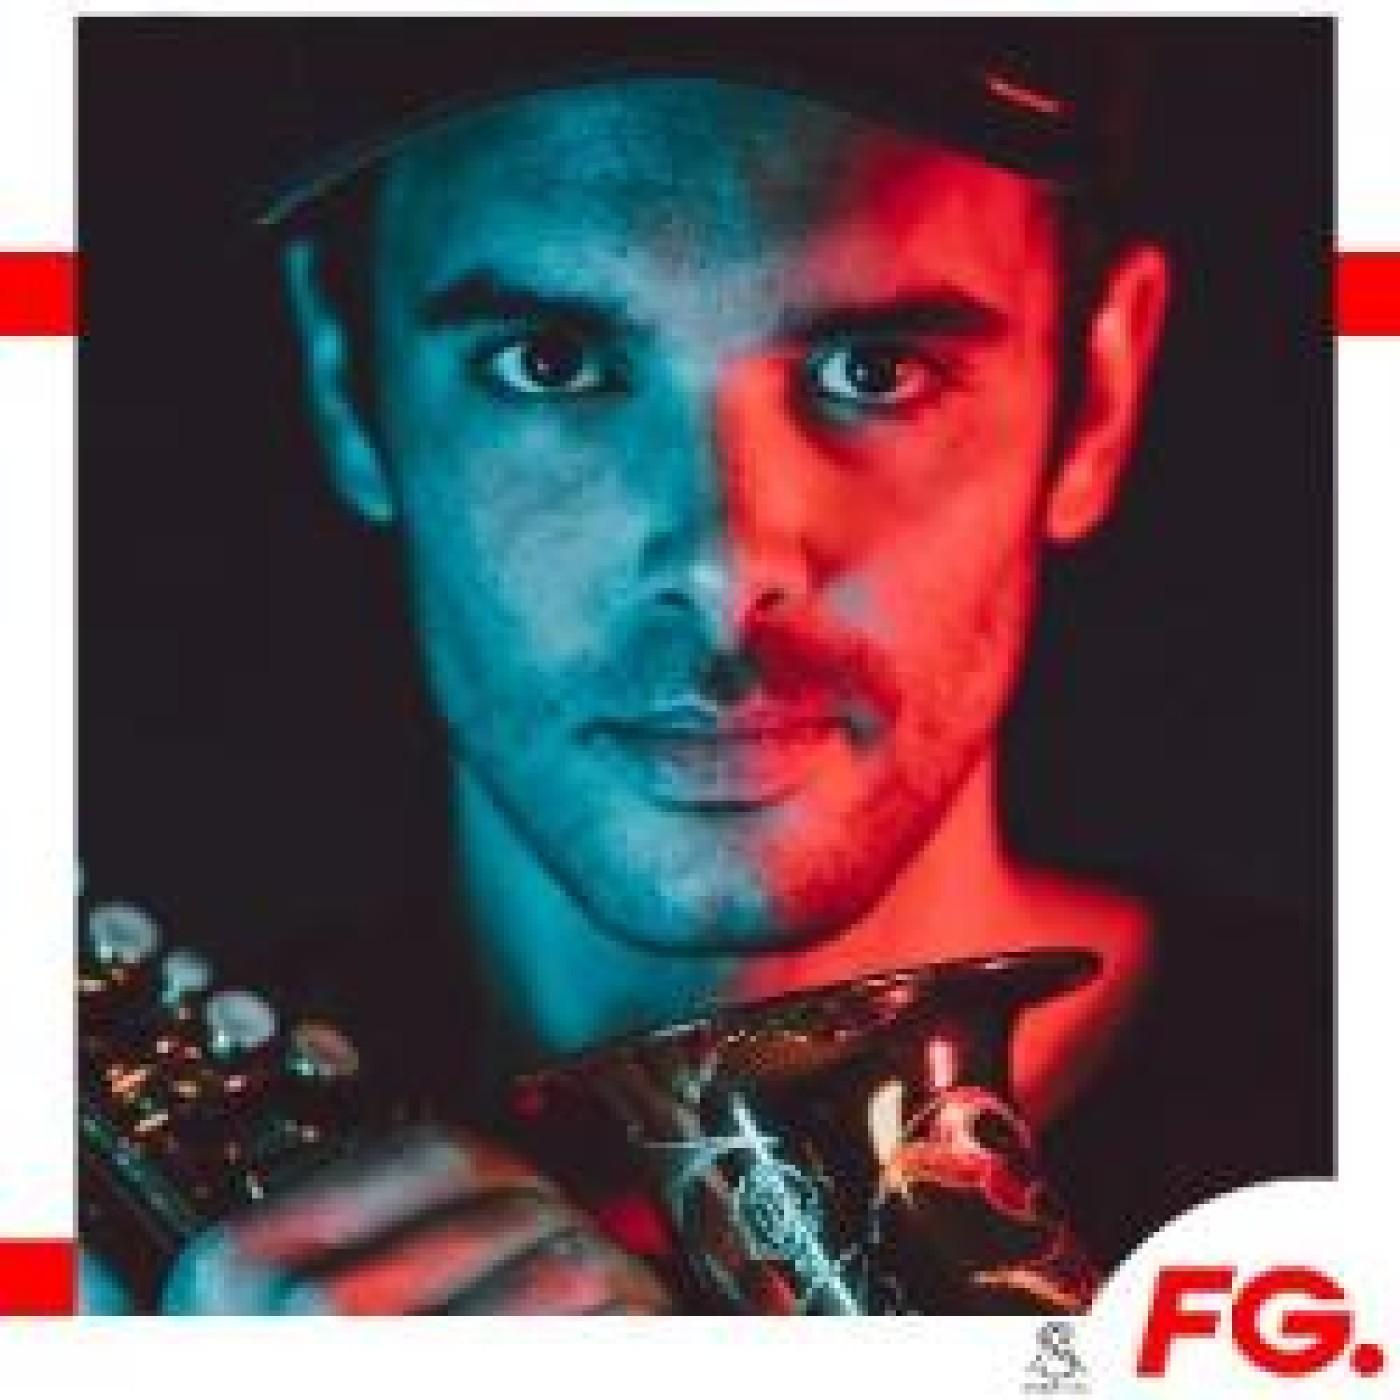 CLUB FG : SANDY SAX